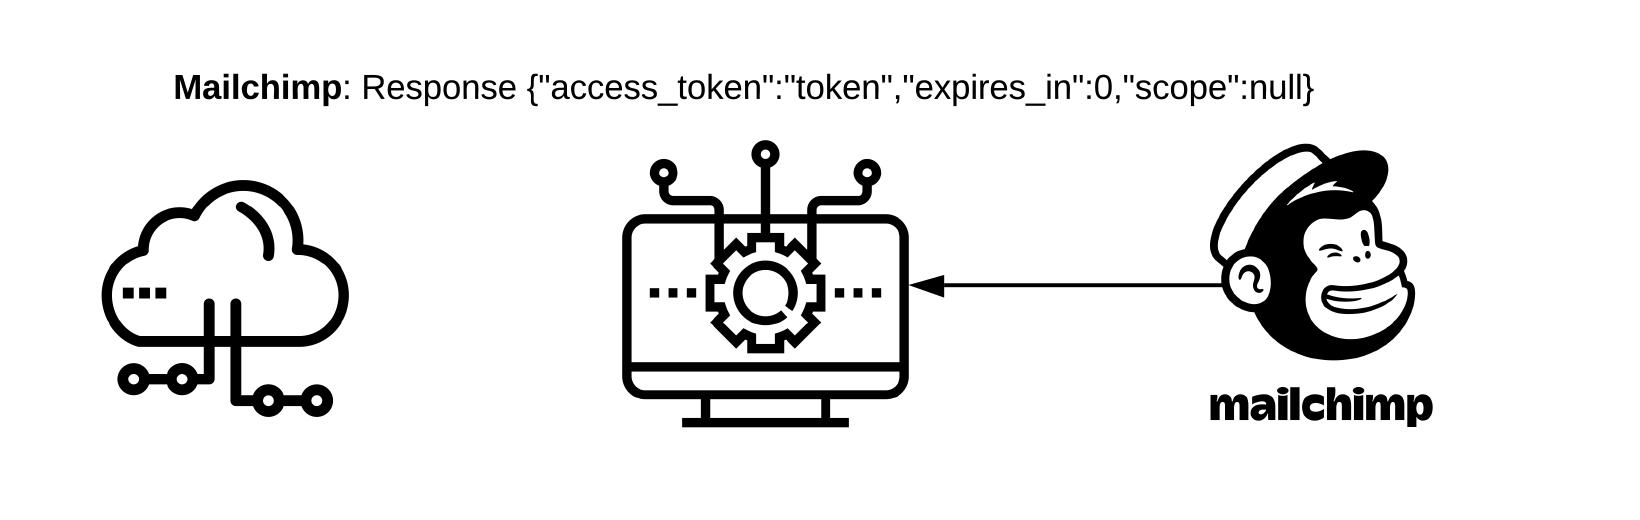 "Mailchimp: Response { ""access_token"": ""token"", ""expires_in"": 0, ""scope"": null }"